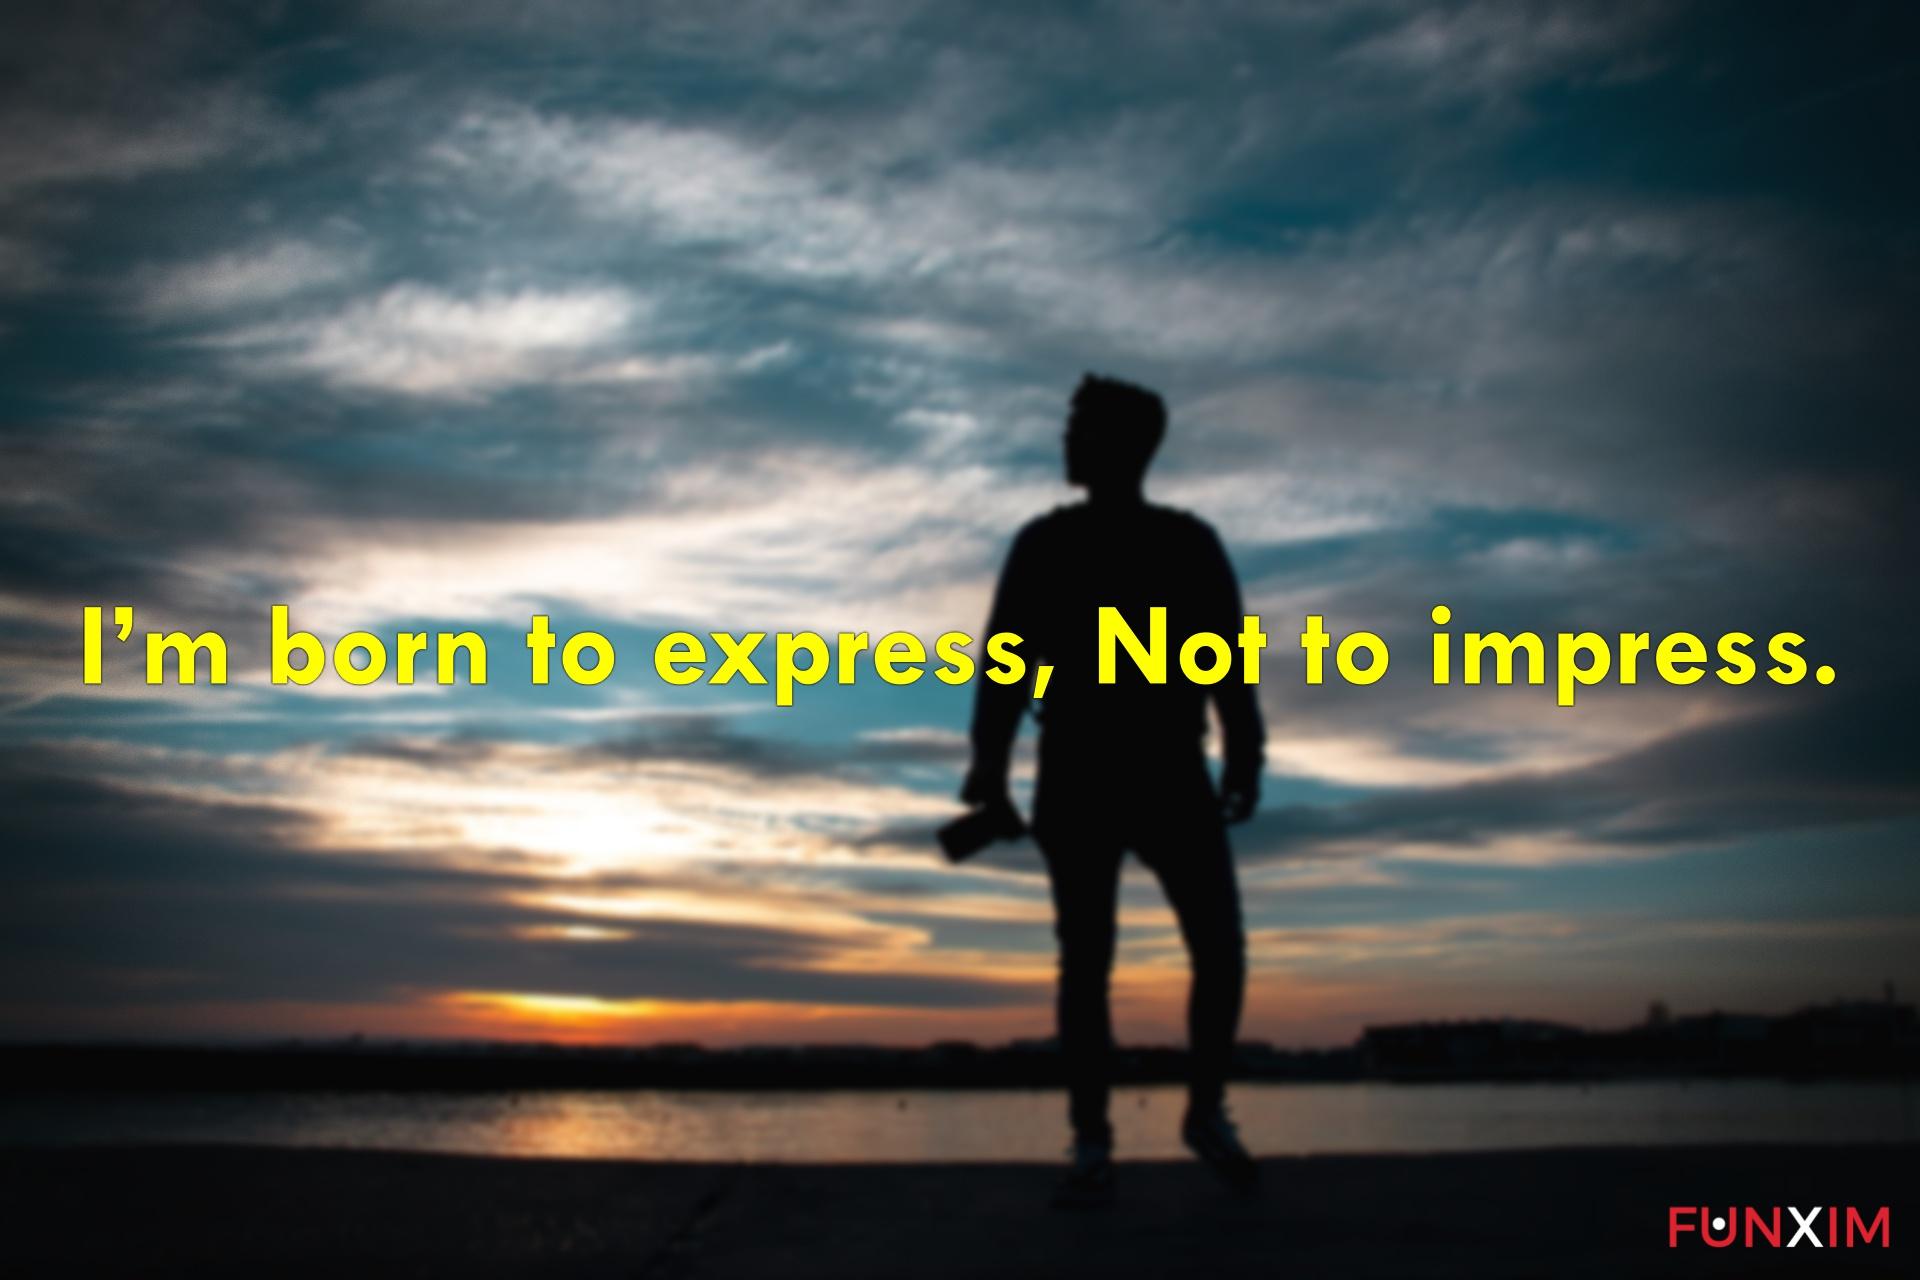 I'm born to express, not to impress.